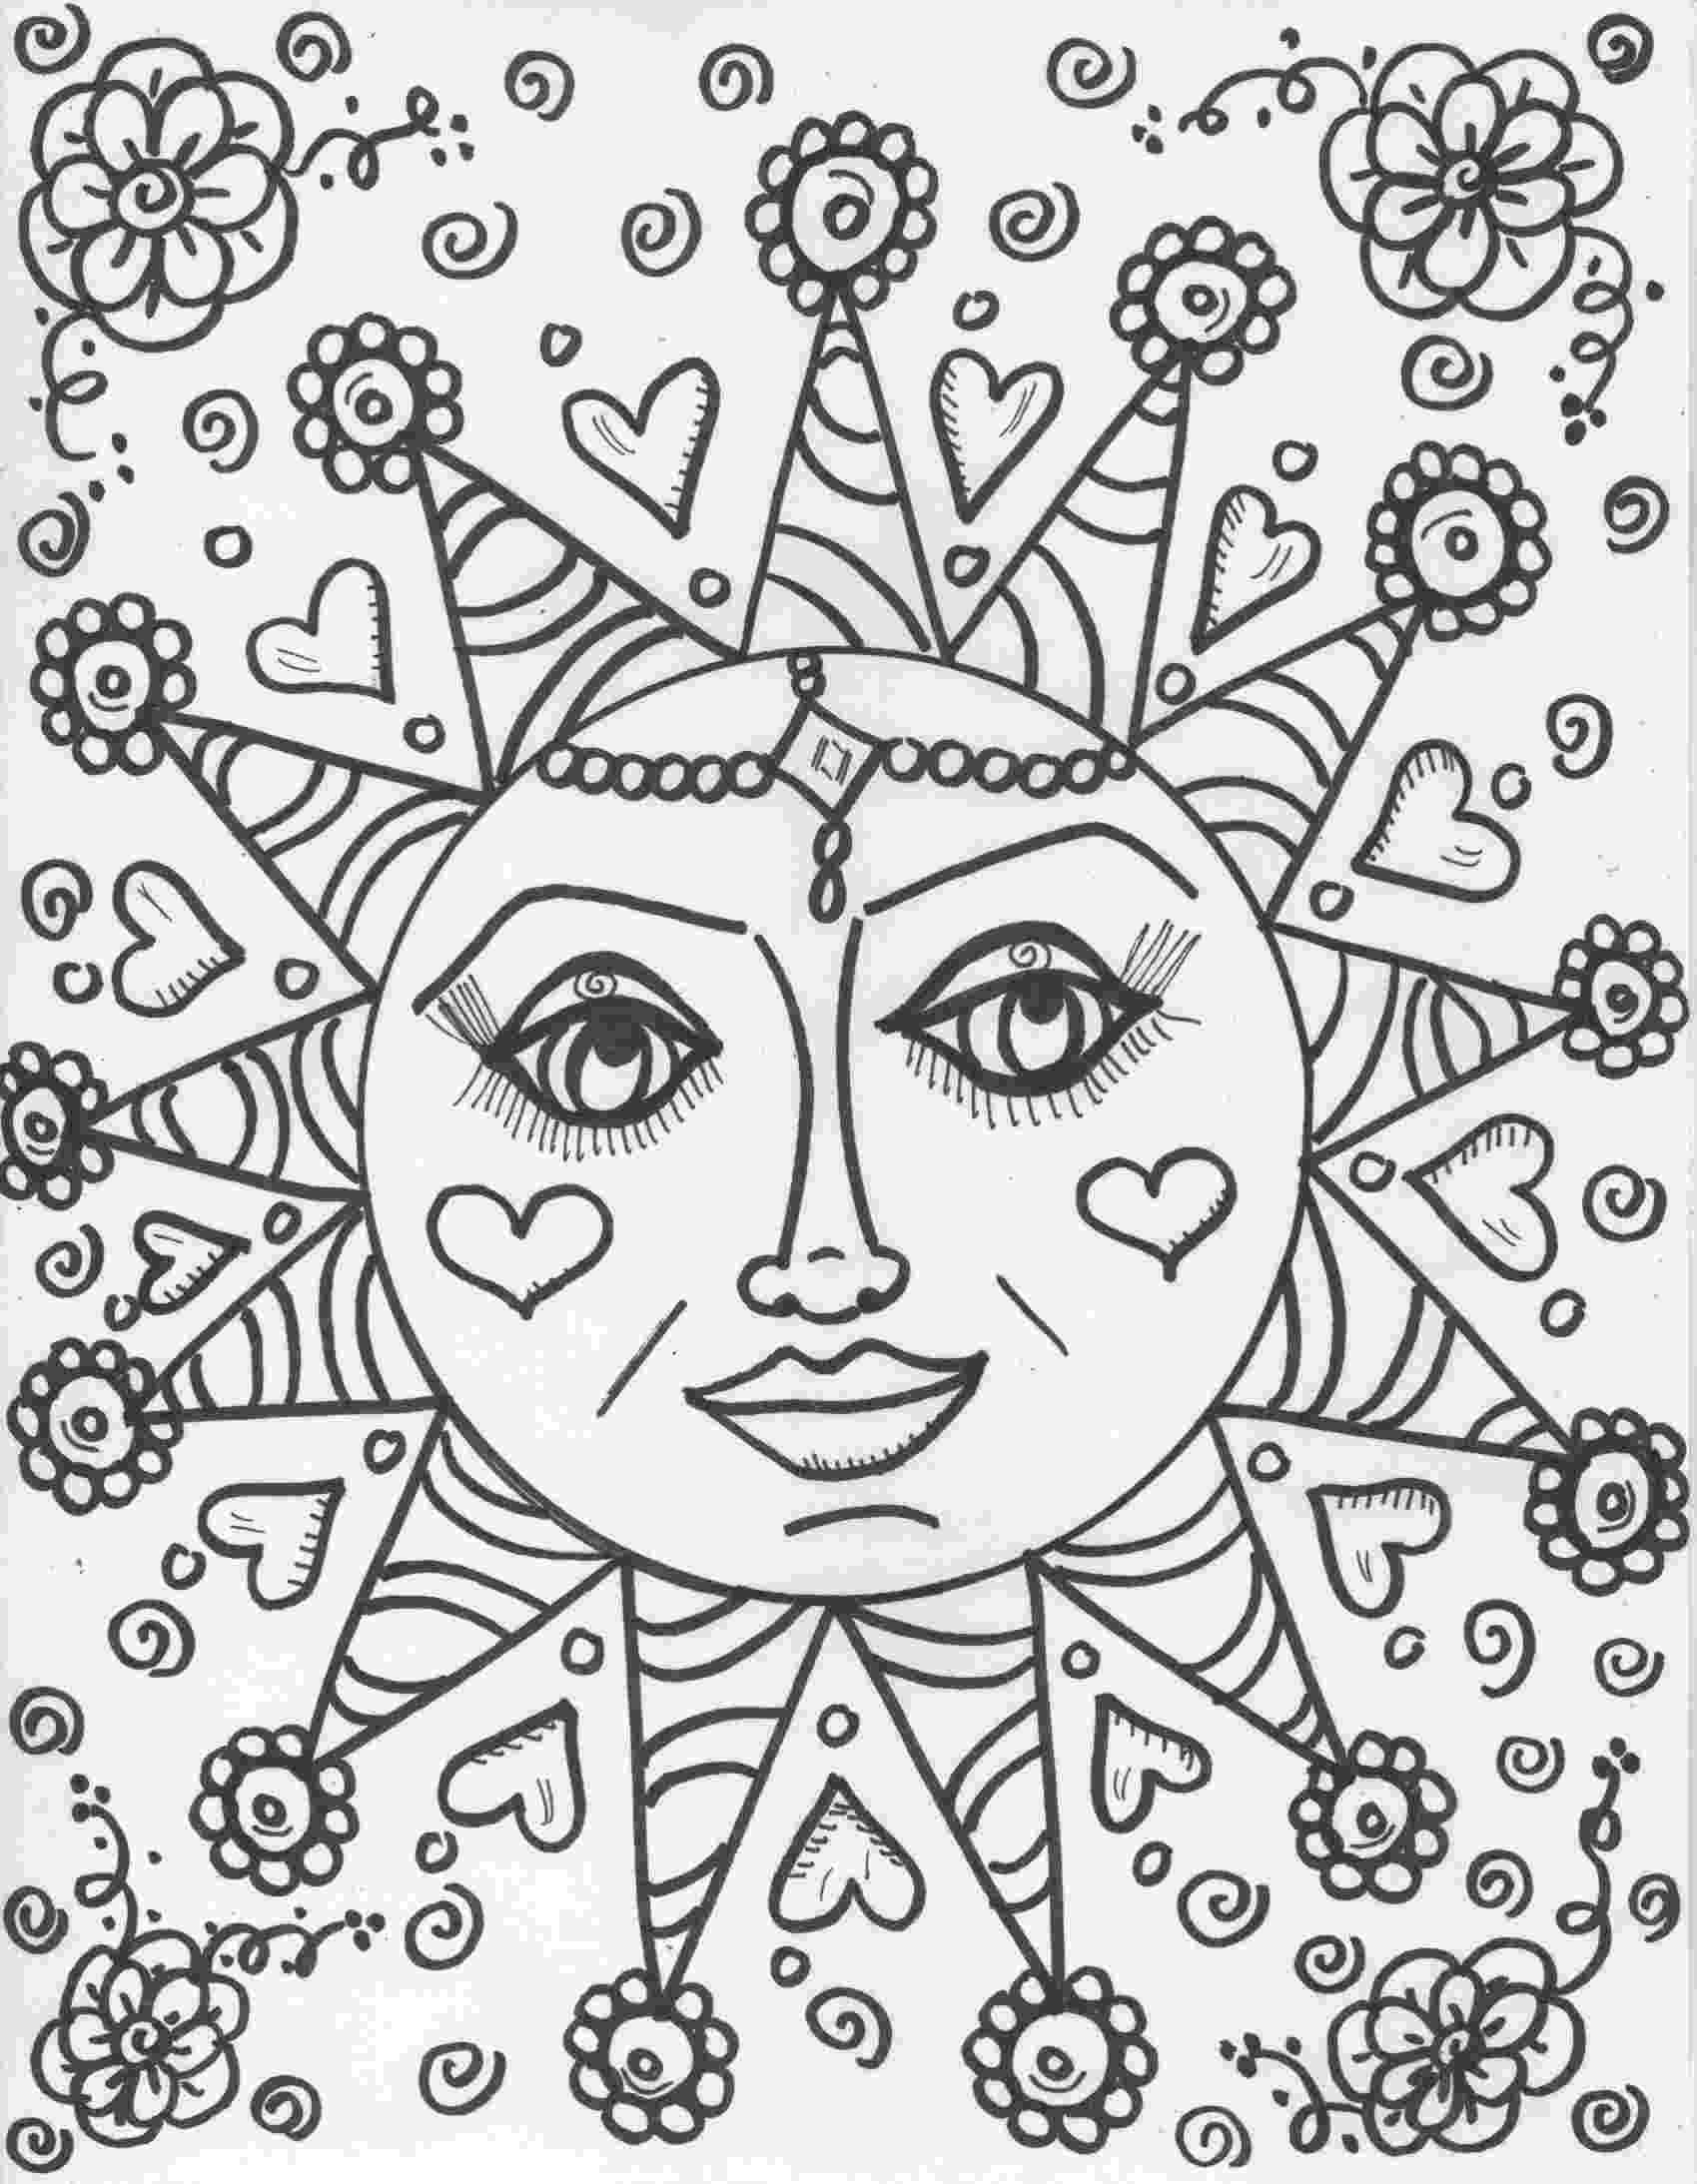 hippie coloring sheets hippie animals coloring book amazonca thaneeya mcardle sheets coloring hippie